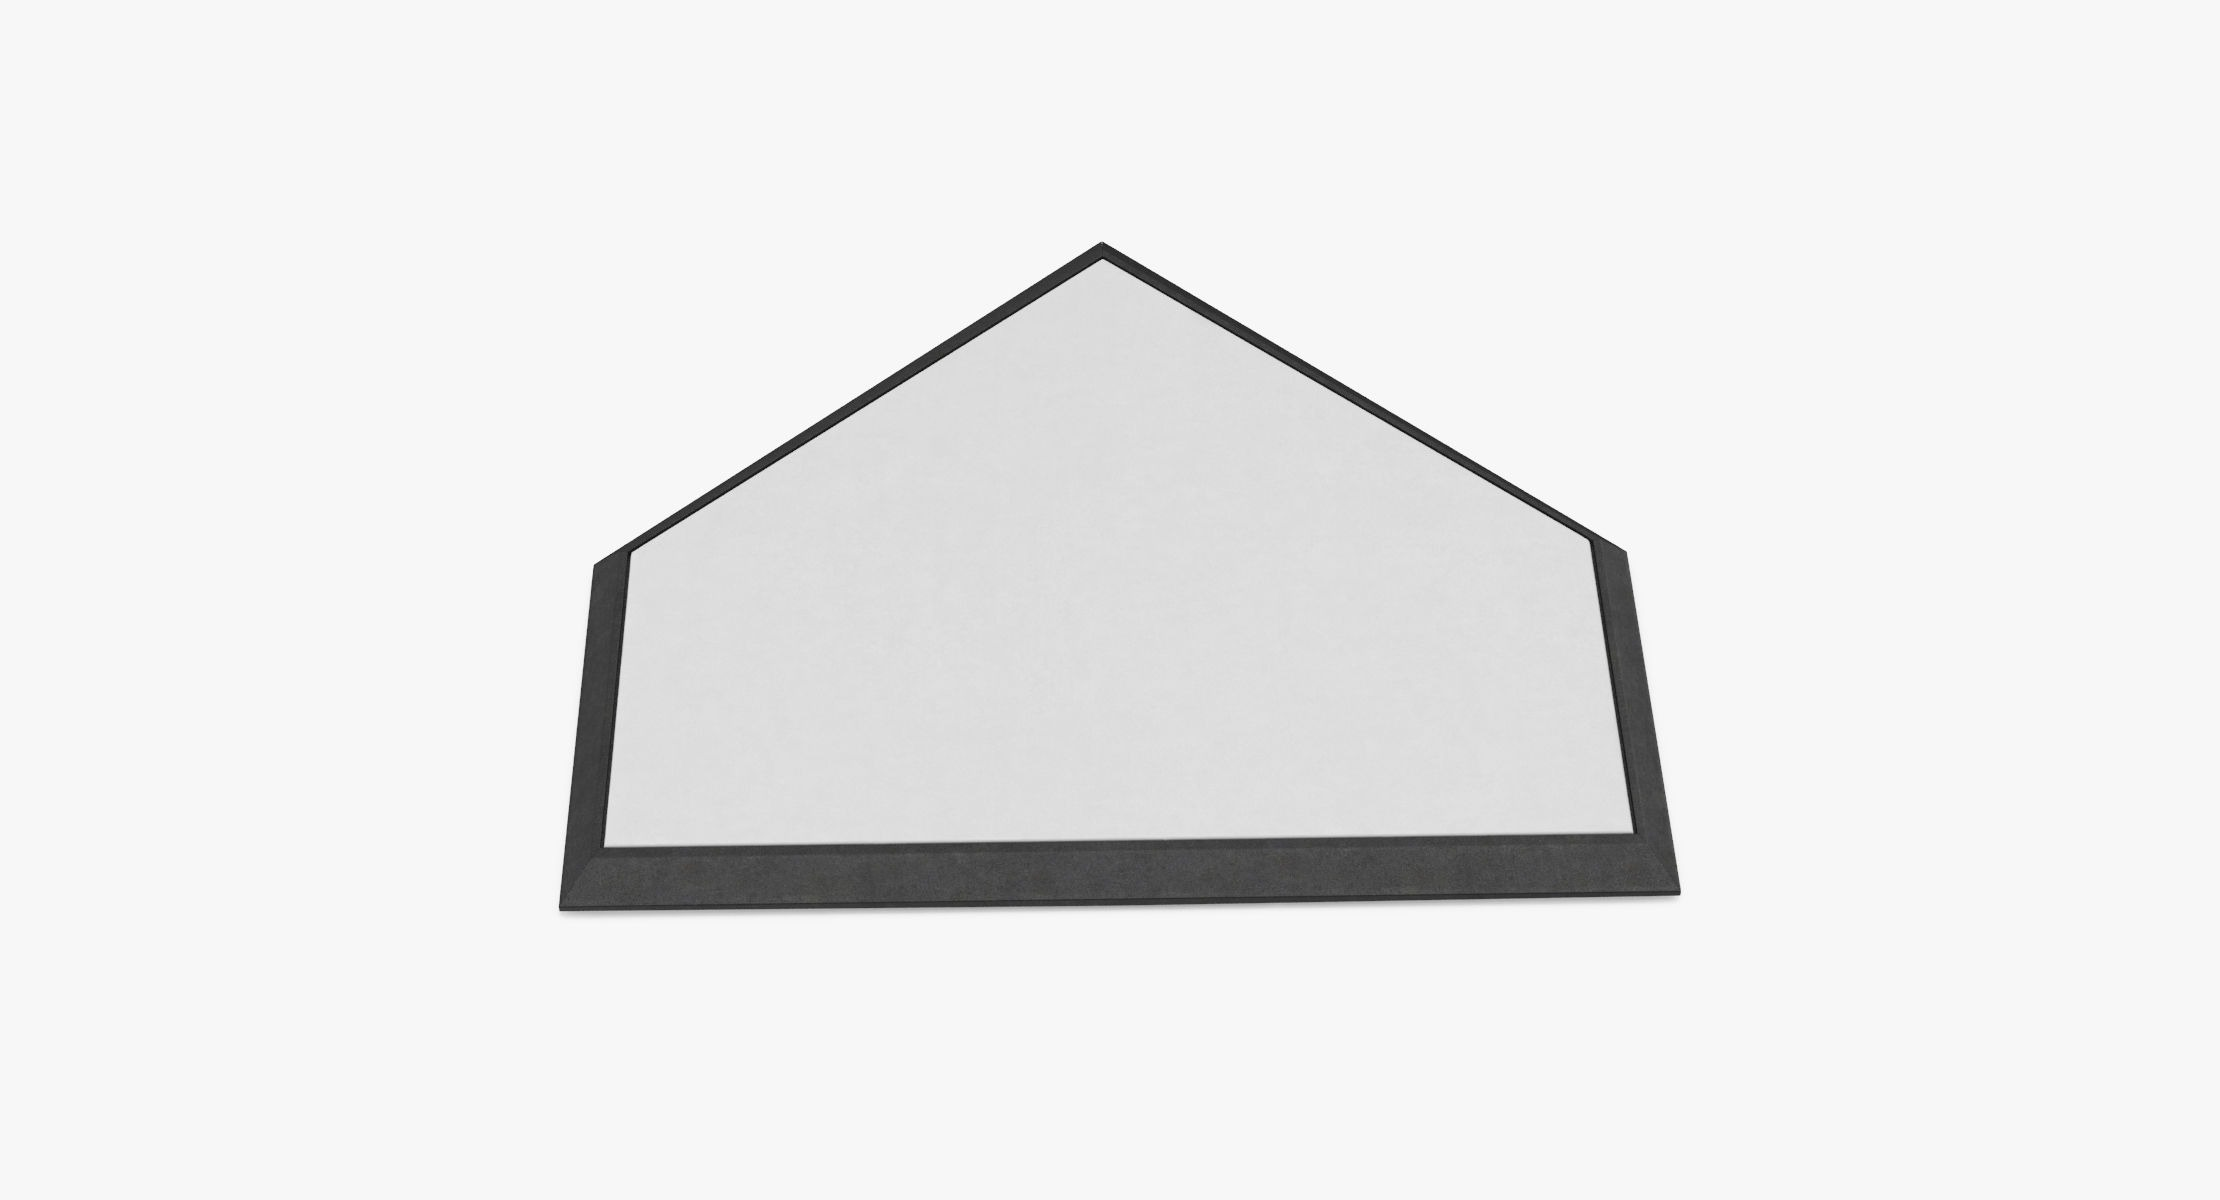 Home Plate - reel 1